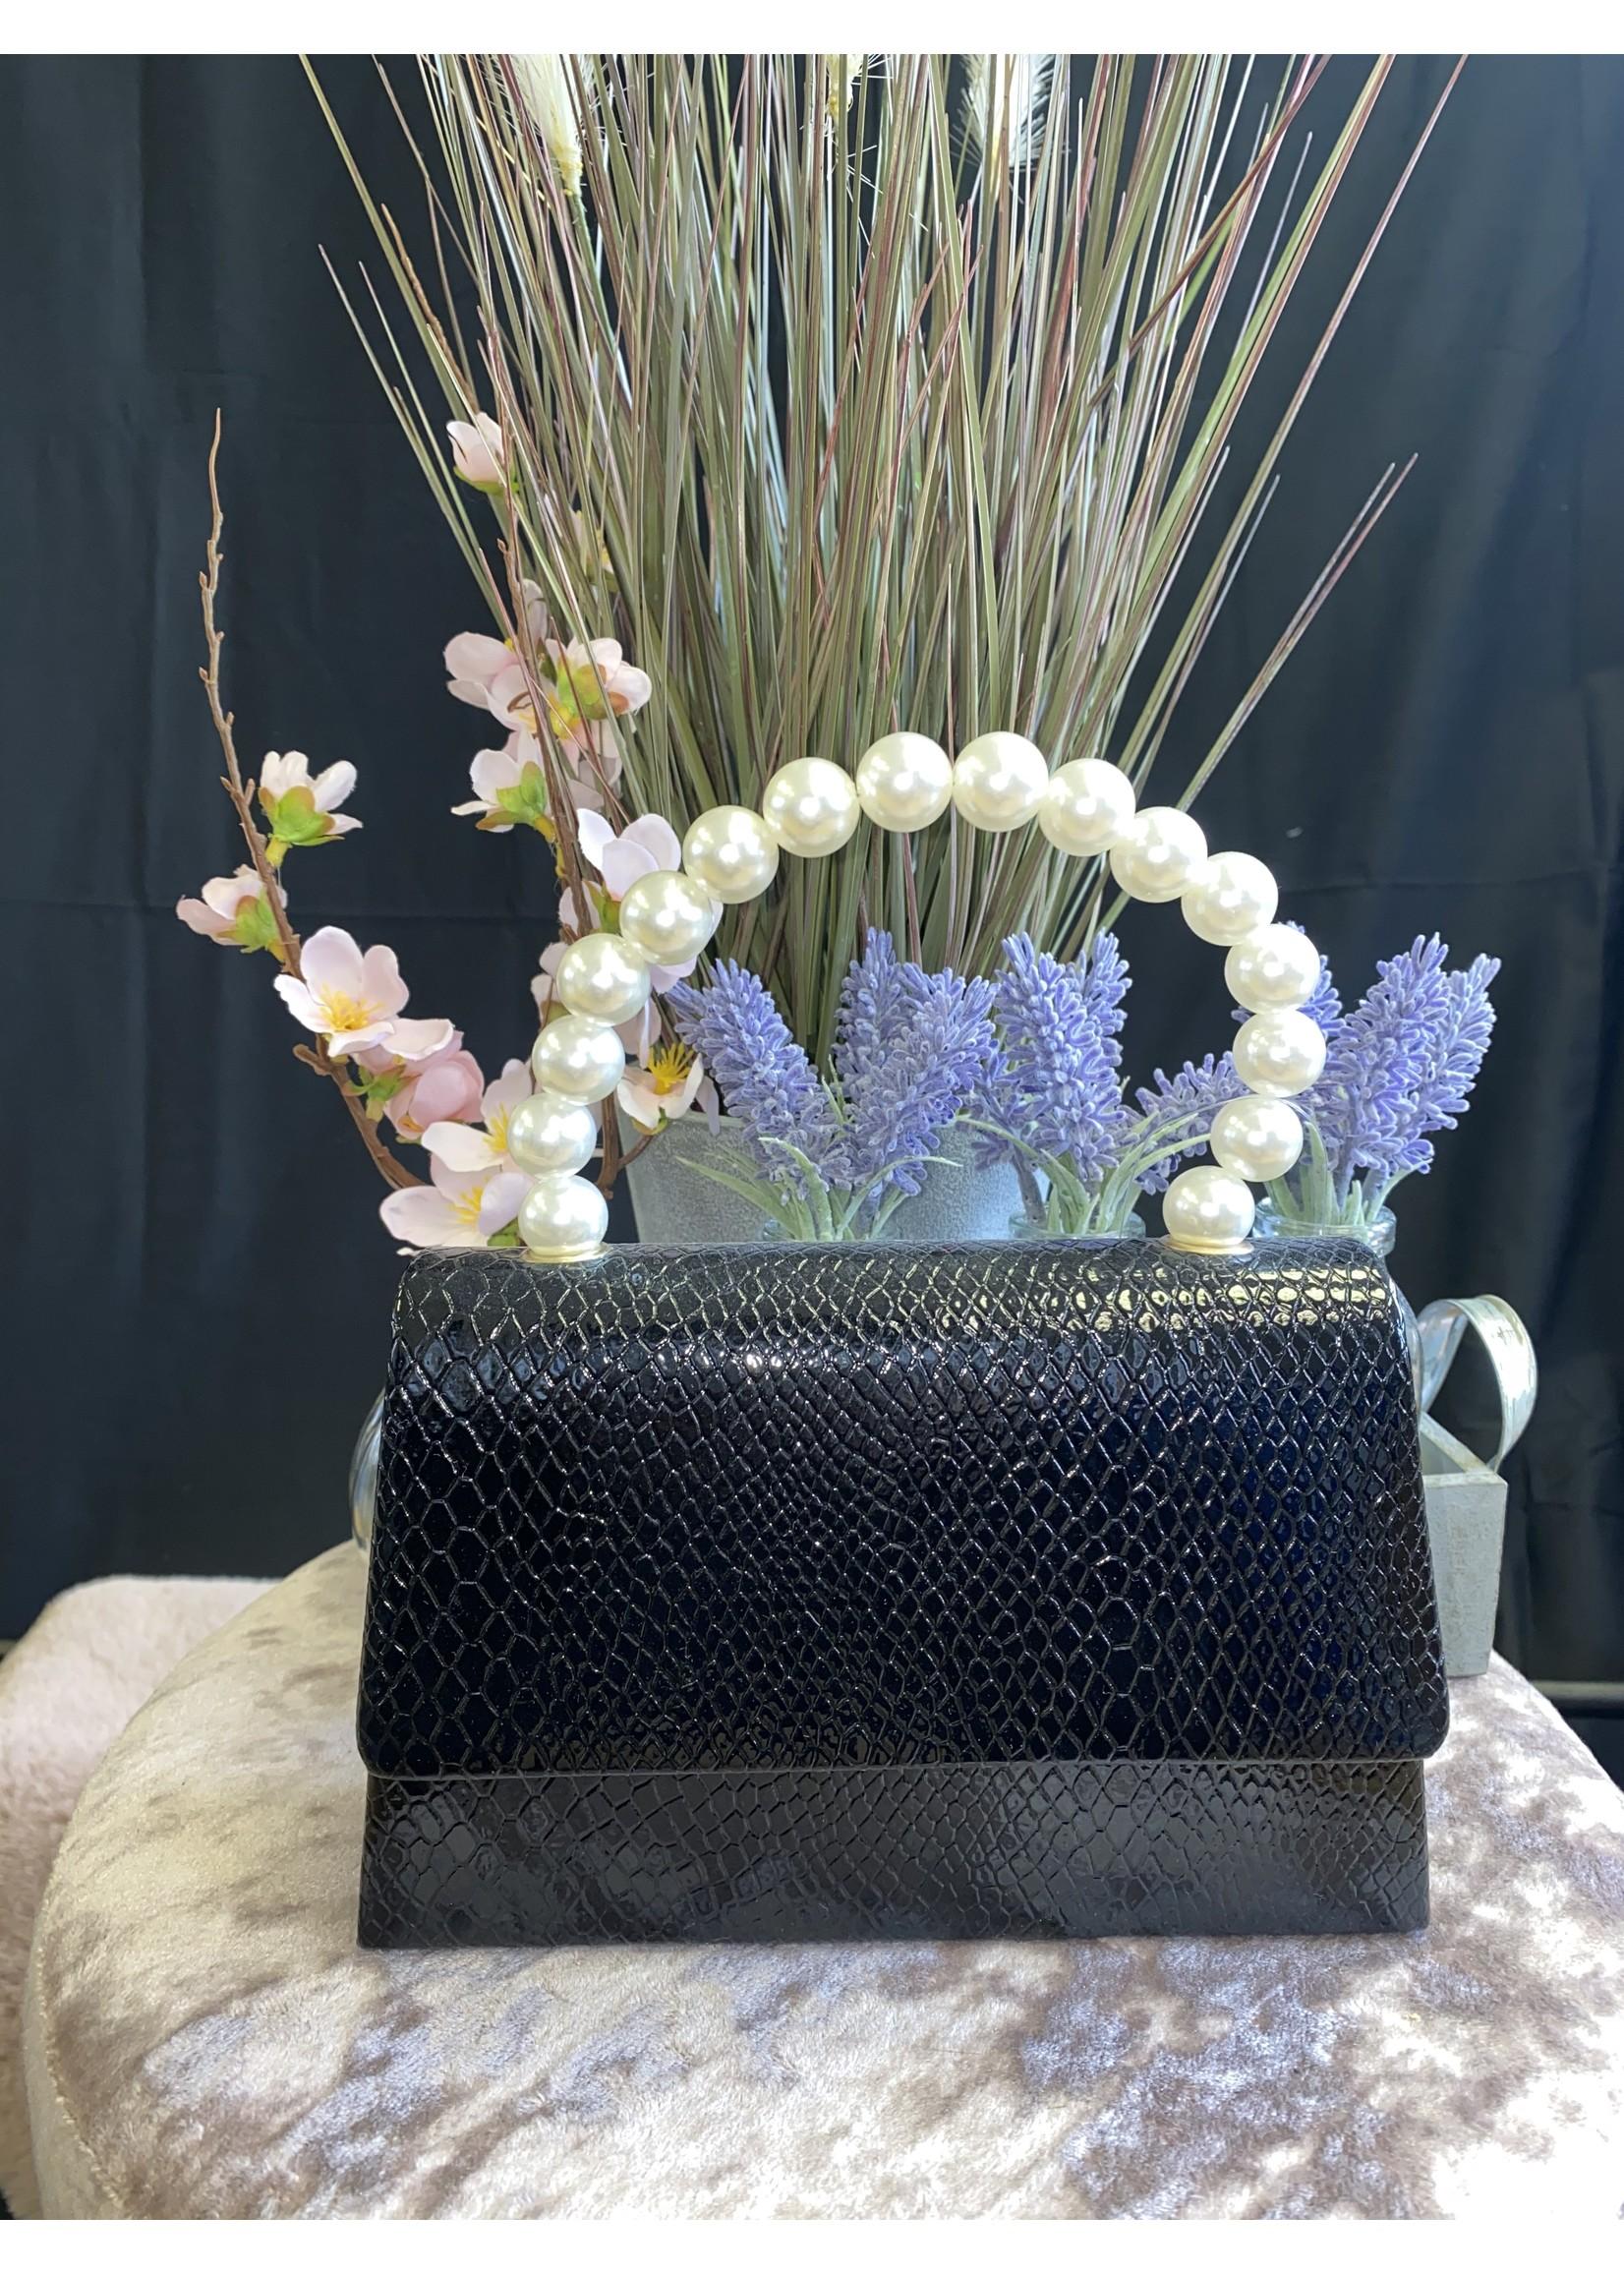 Pearl handle mini evening bag